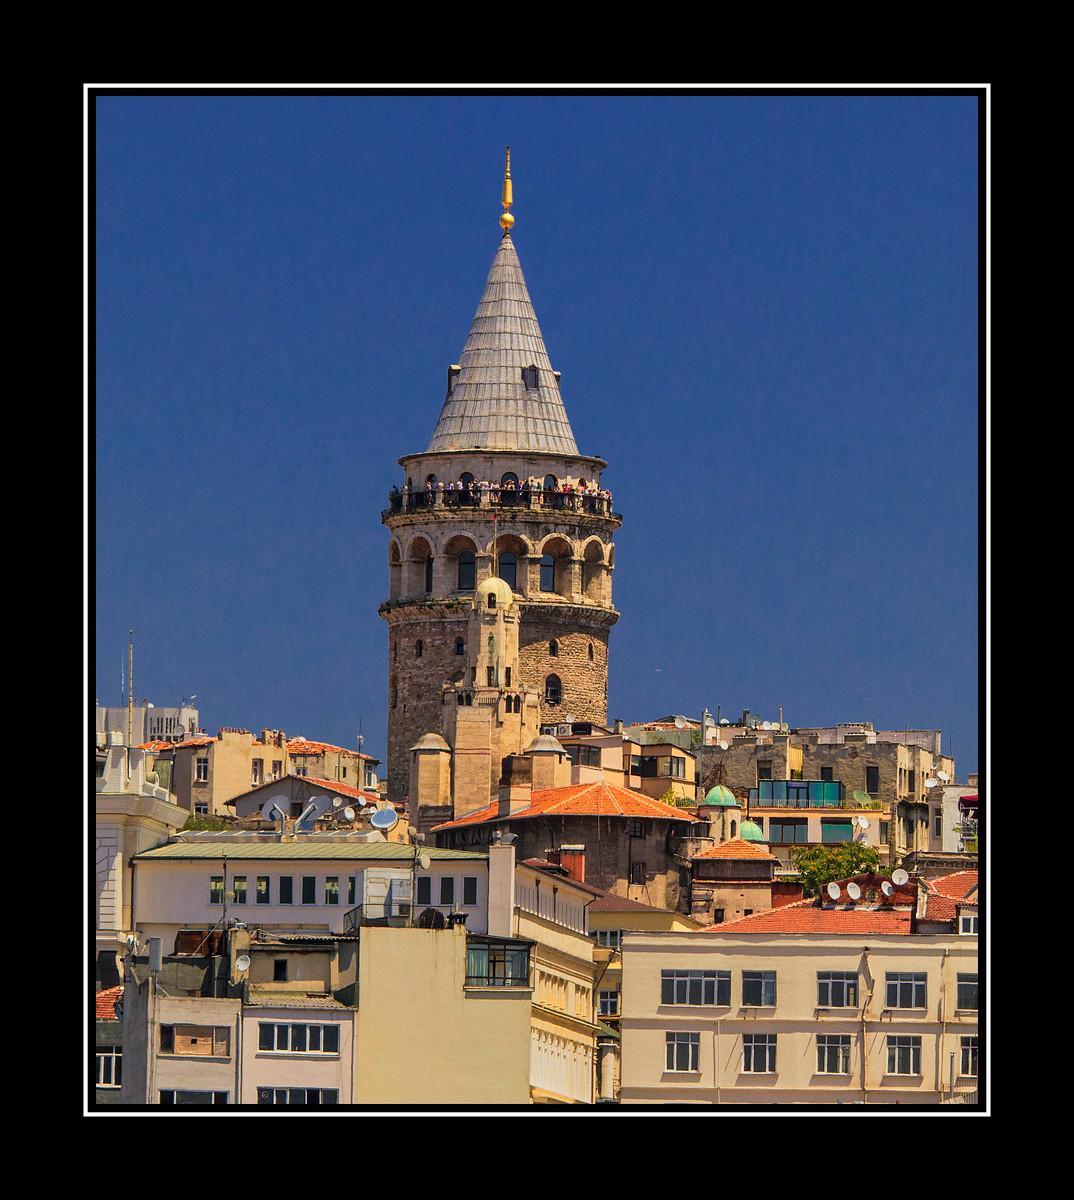 IMAGE: https://photos.smugmug.com/Travel/Istanbul/i-HrD7GjD/0/67833ecb/X3/Galata%20Tower%2002-X3.jpg